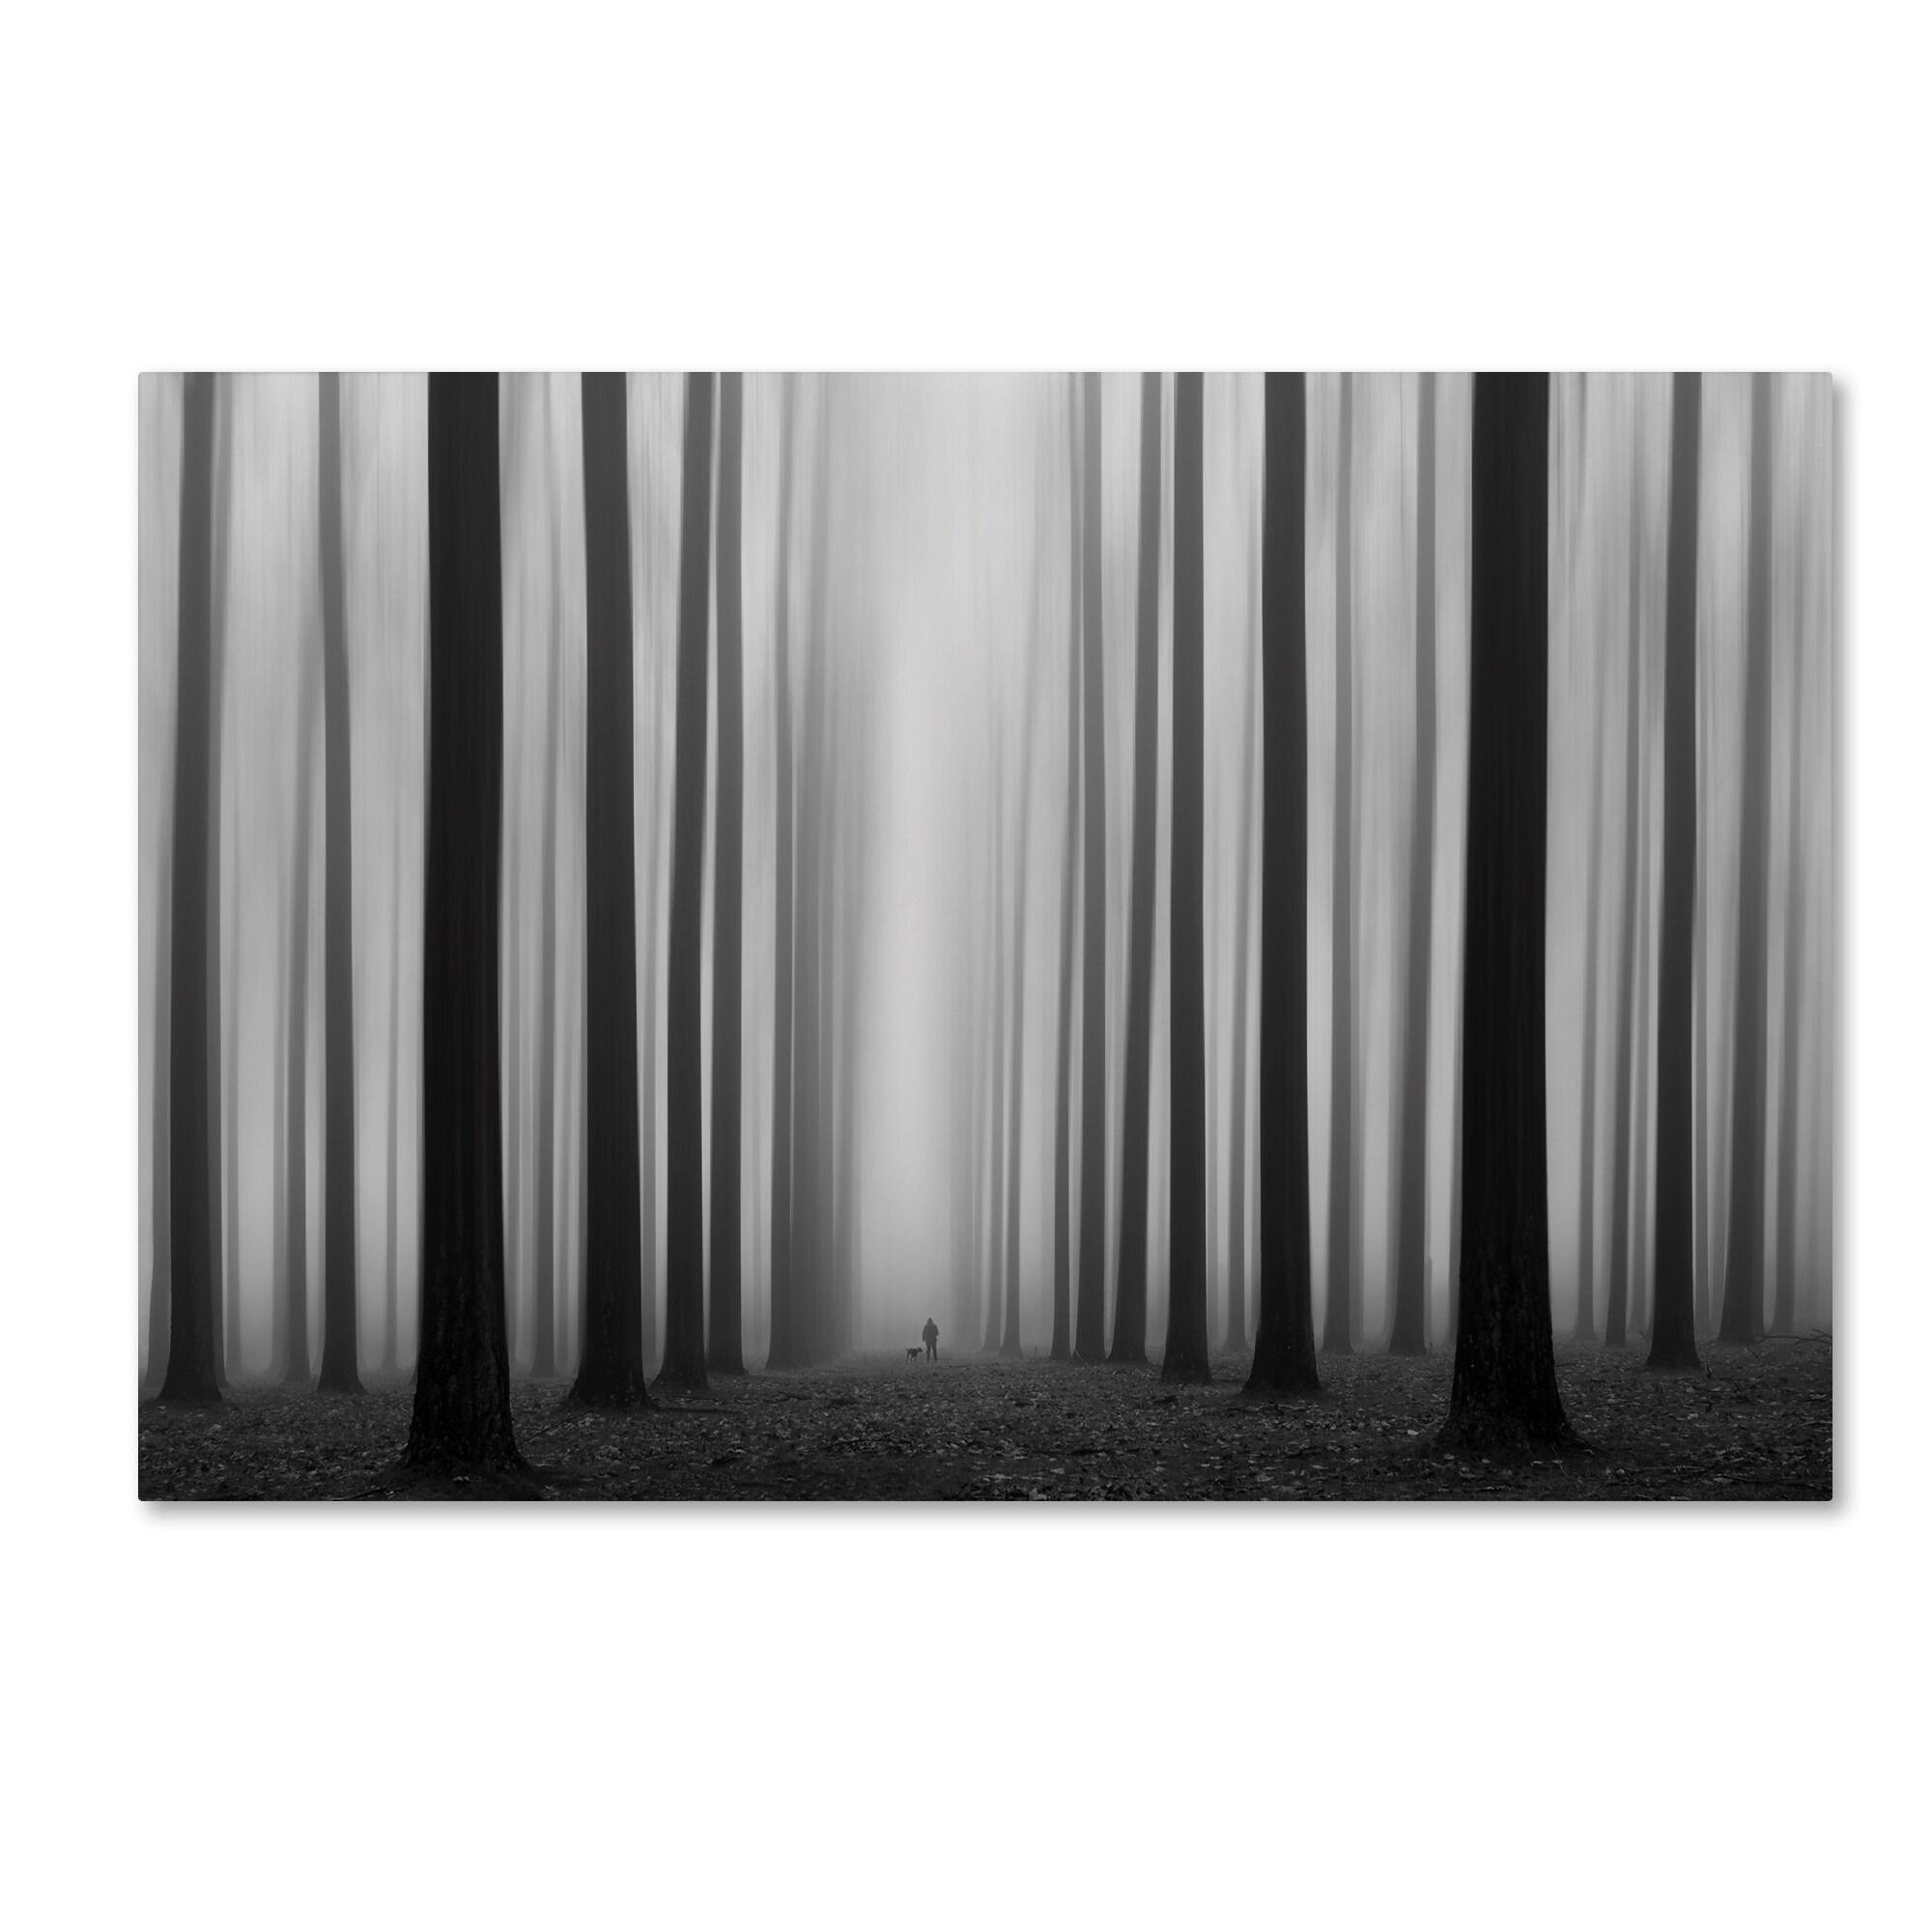 Trademark Jochen Bongaerts 'Labyrinth' Canvas Art (30x47)...